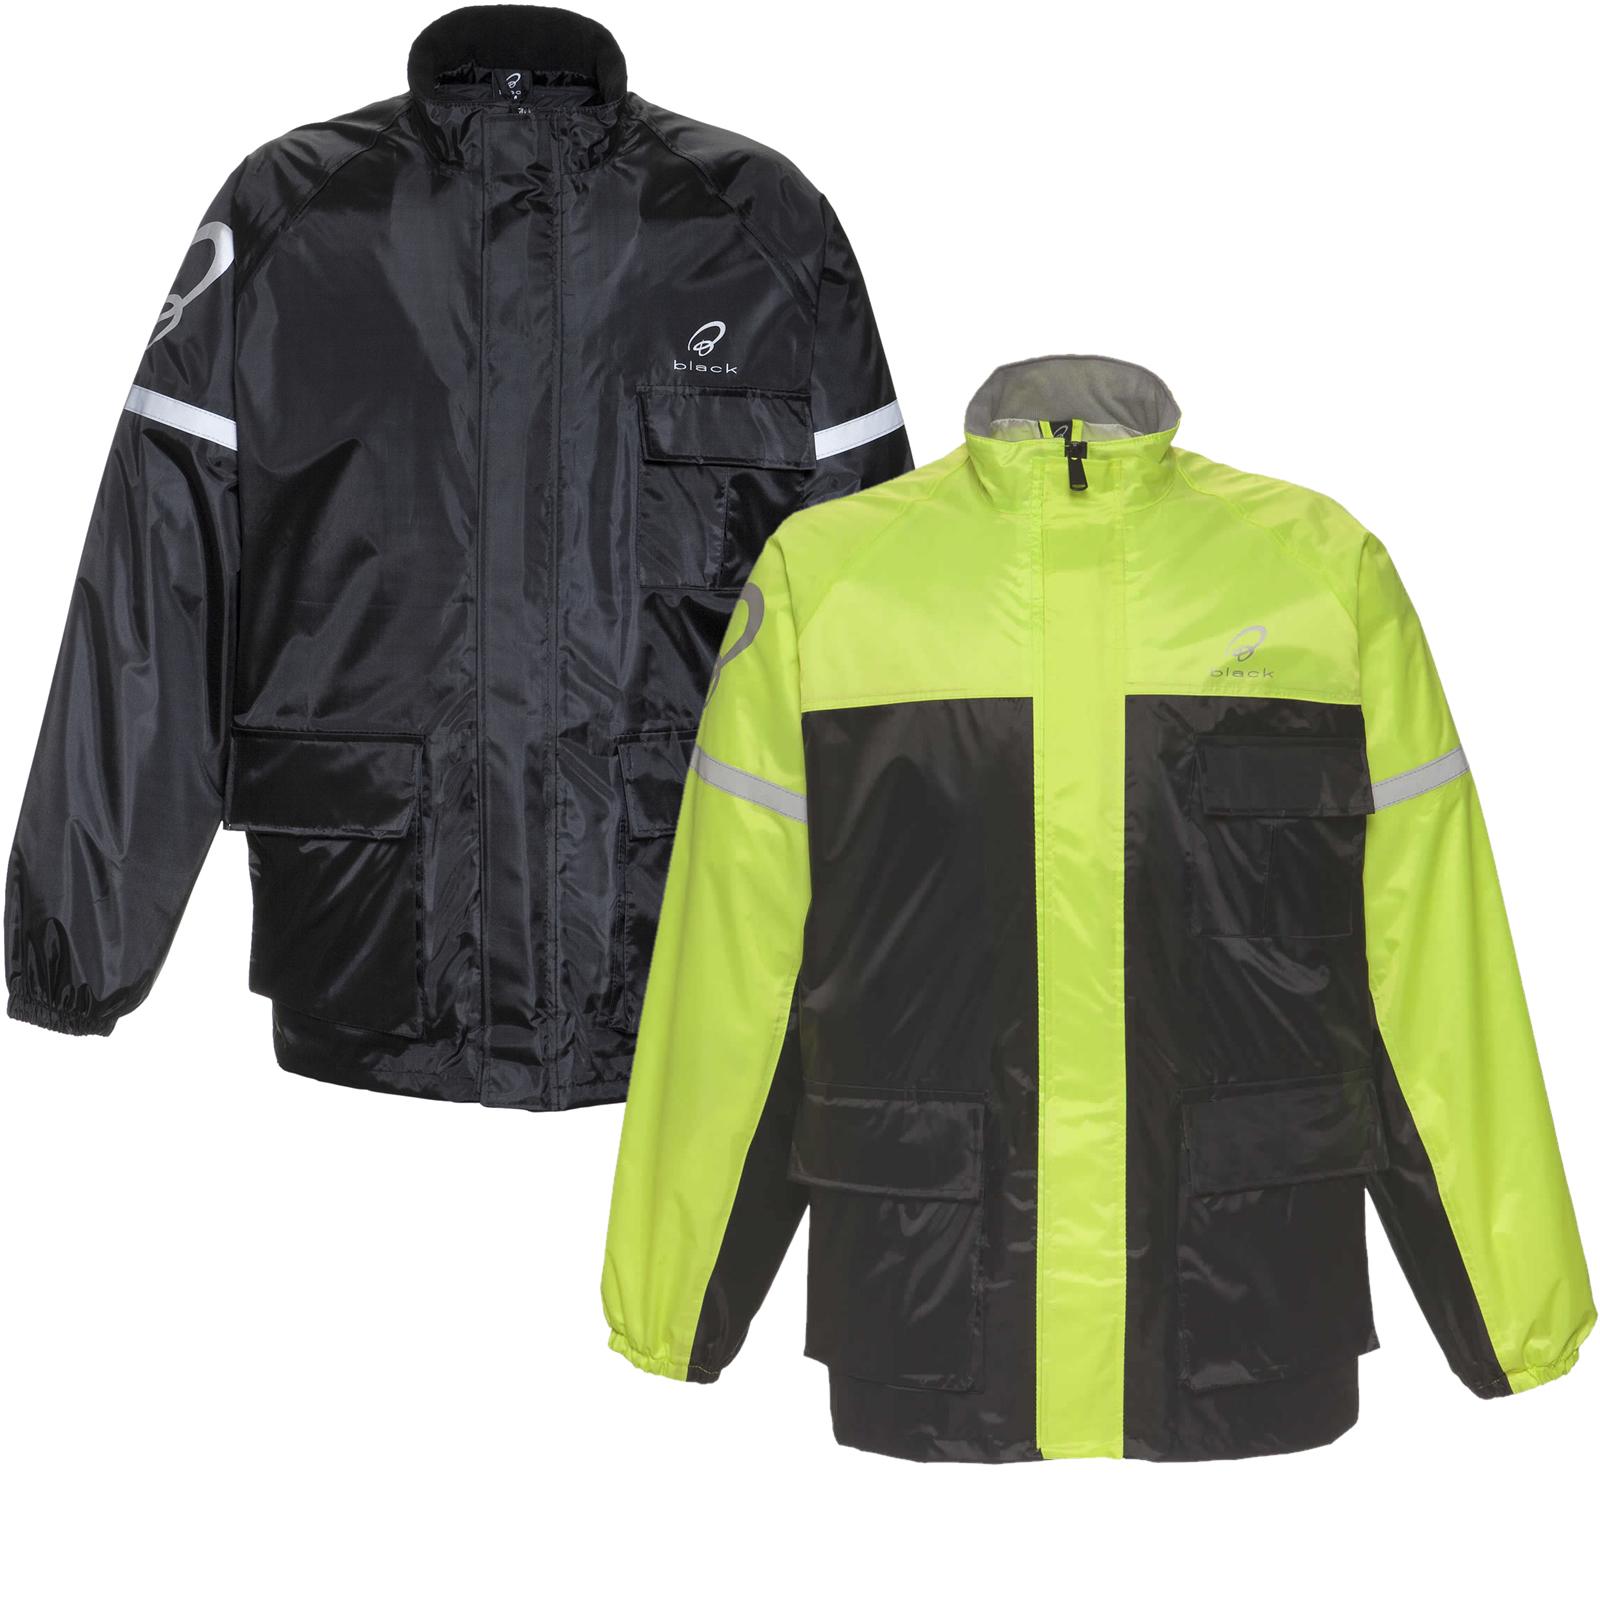 Black Spectre Waterproof Motorcycle Over Jacket + Storage Bag £18.13 Delivered with Voucher Code @ Blacks